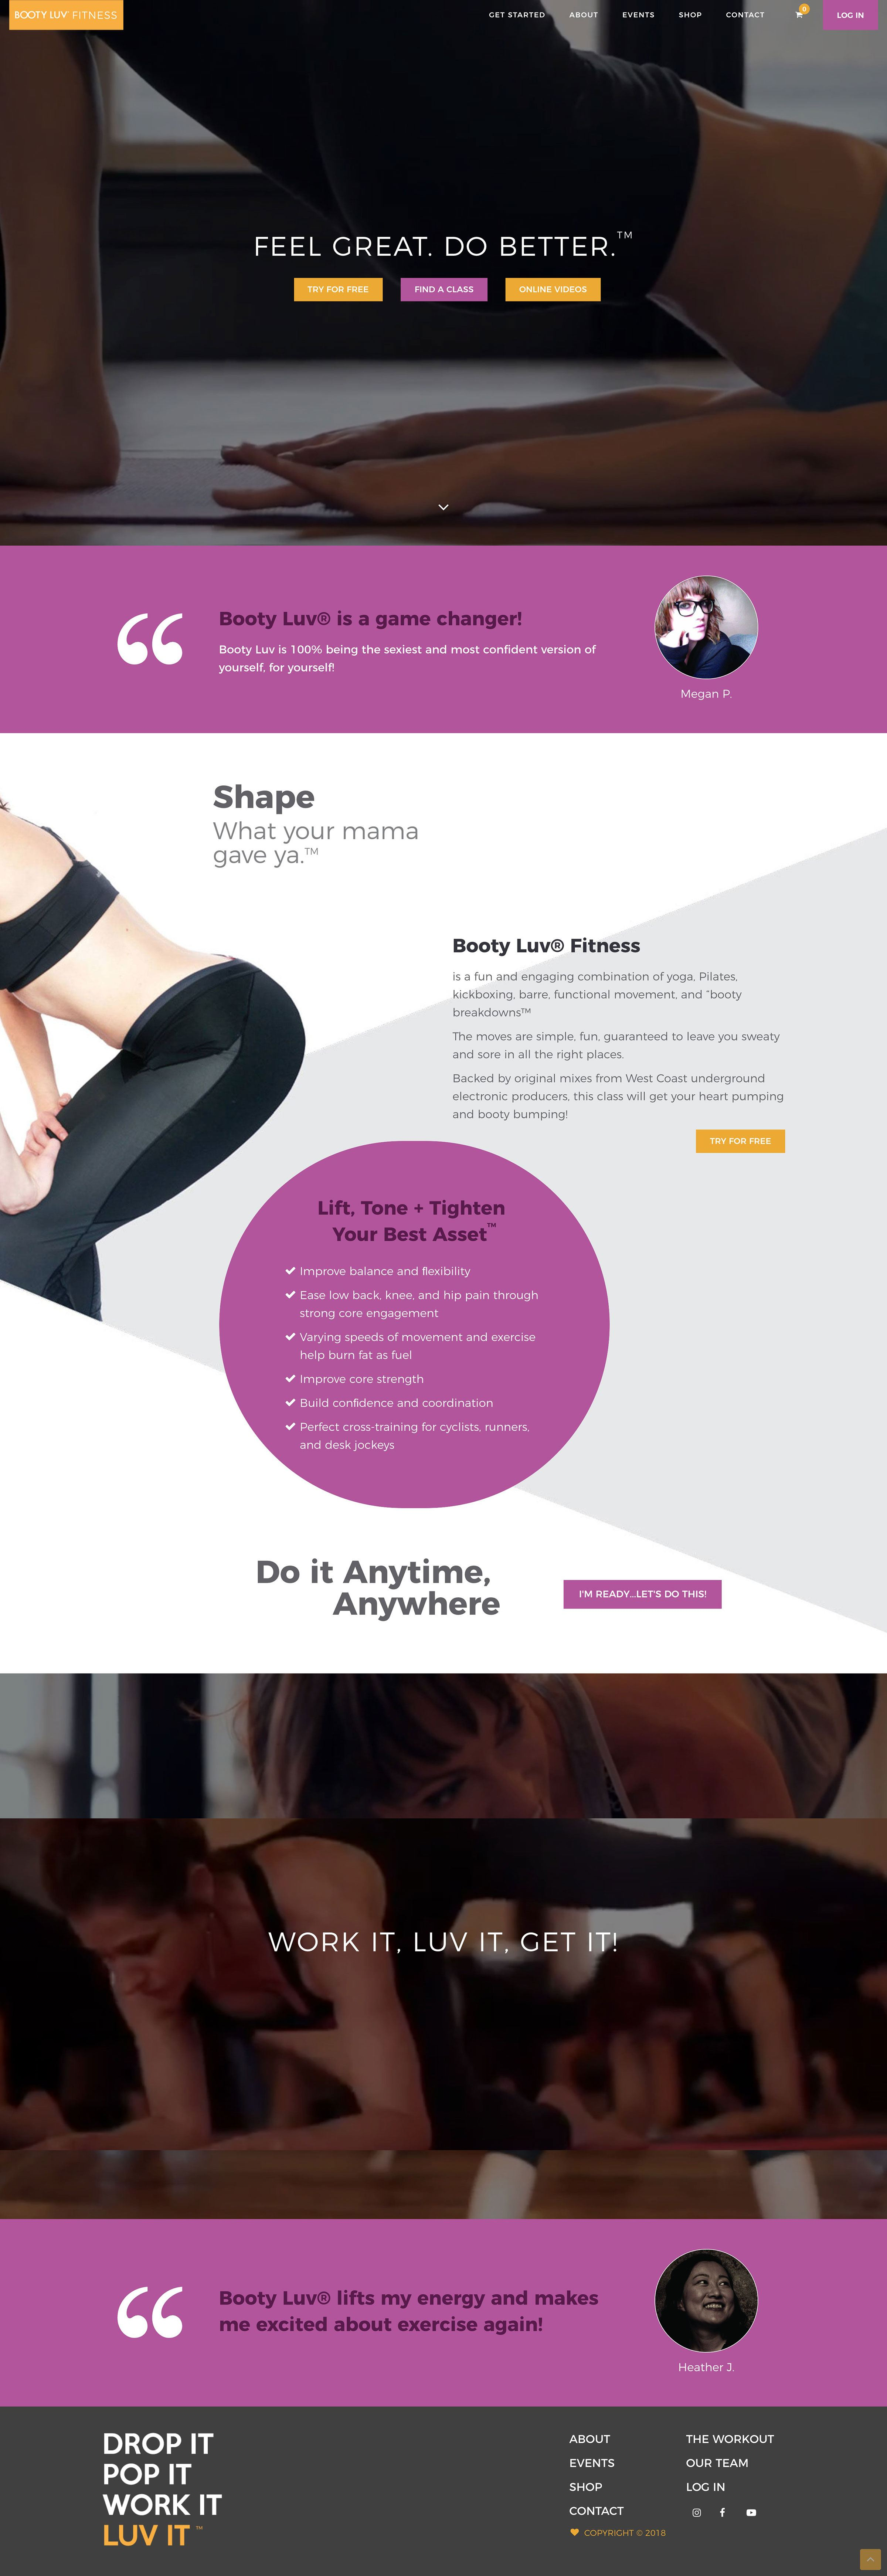 bootyluvfitness-portfolio-1.1